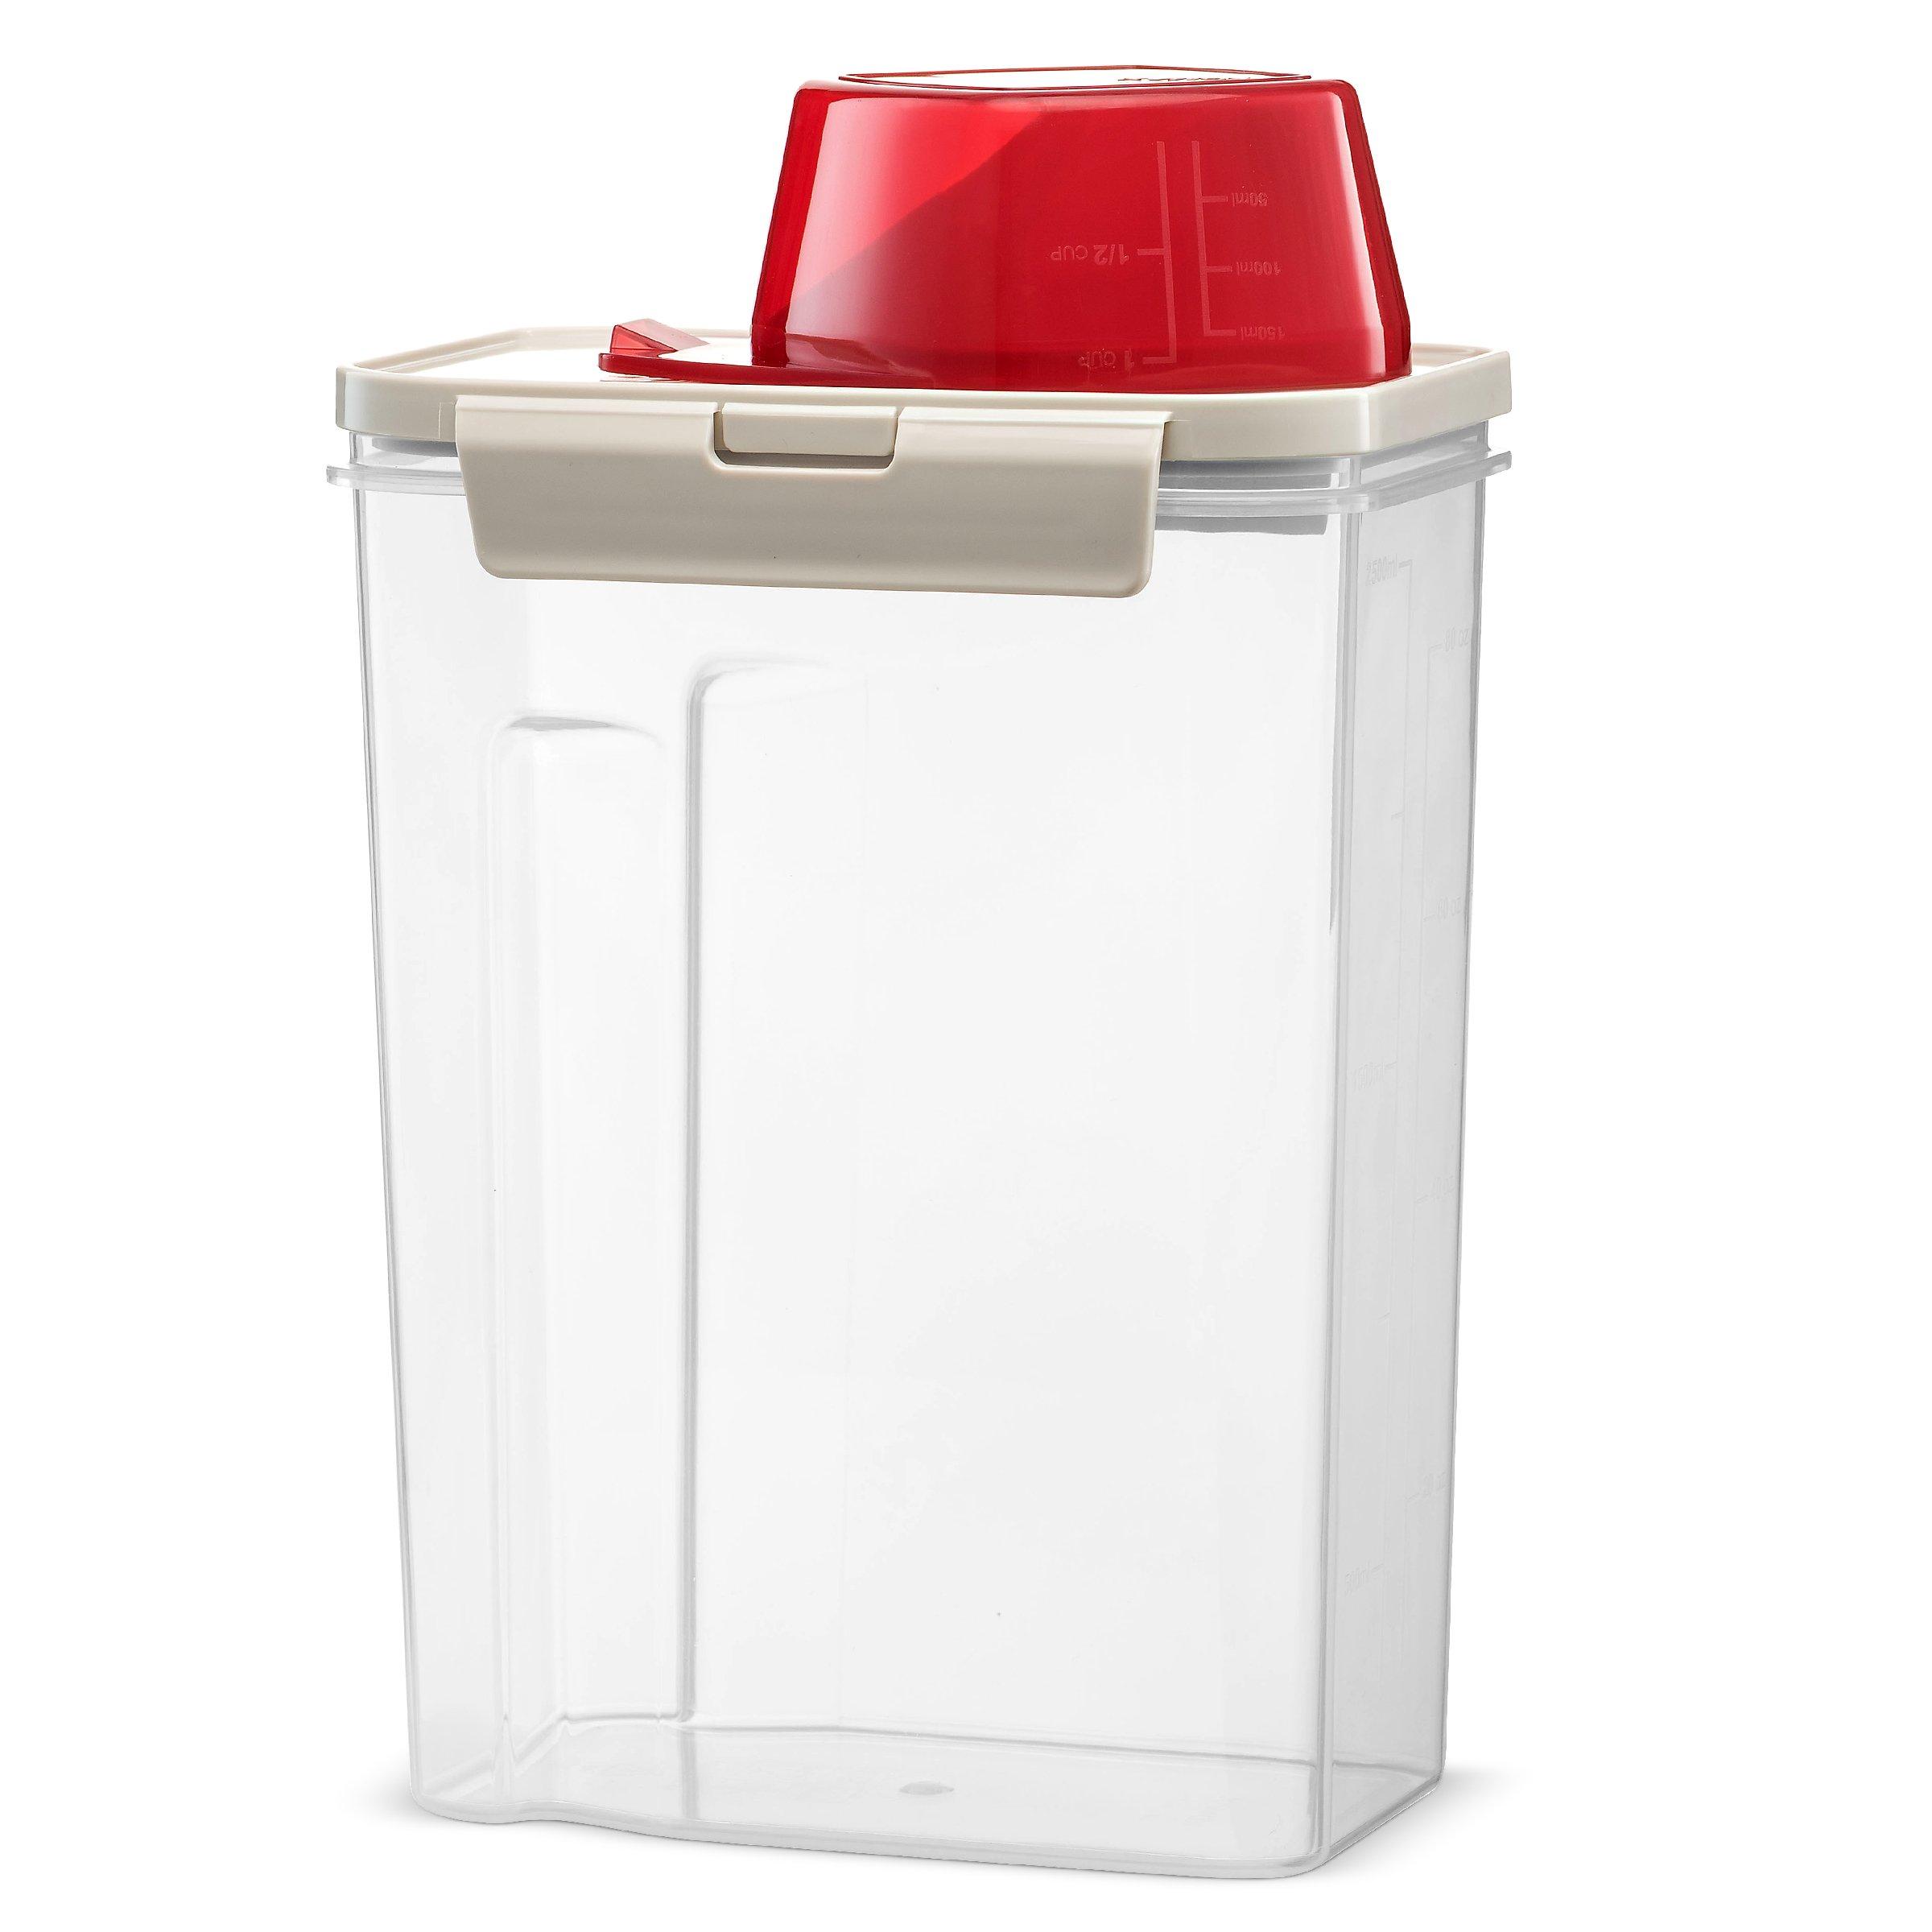 Komax Biokips Fresh Grain Dry Food Plastic Storage Container 28L